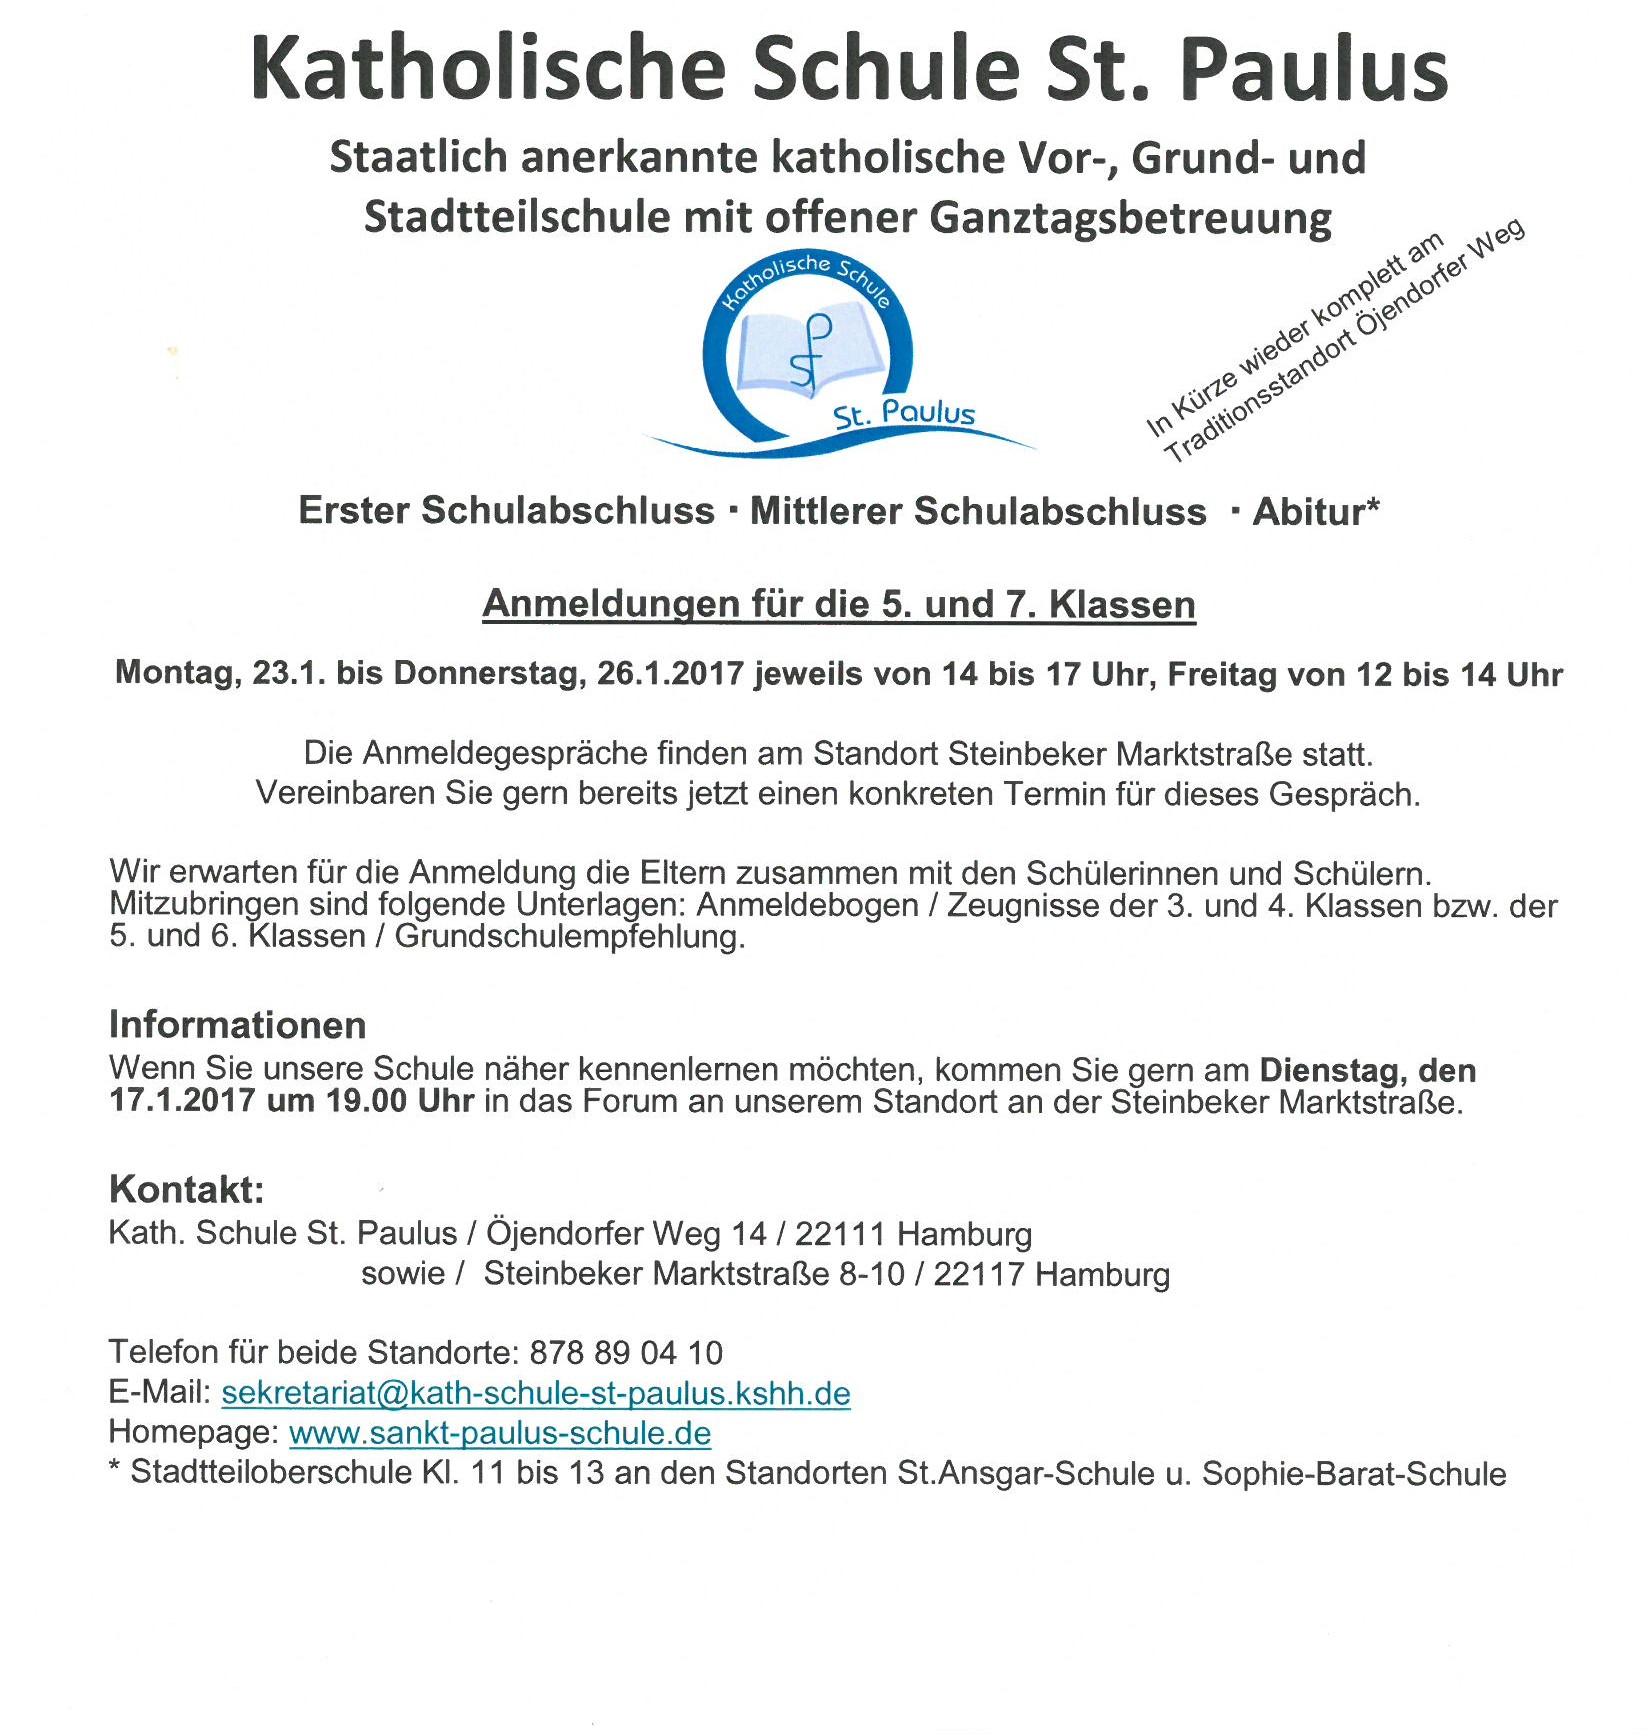 2016-11-19-werbung-homepage-text